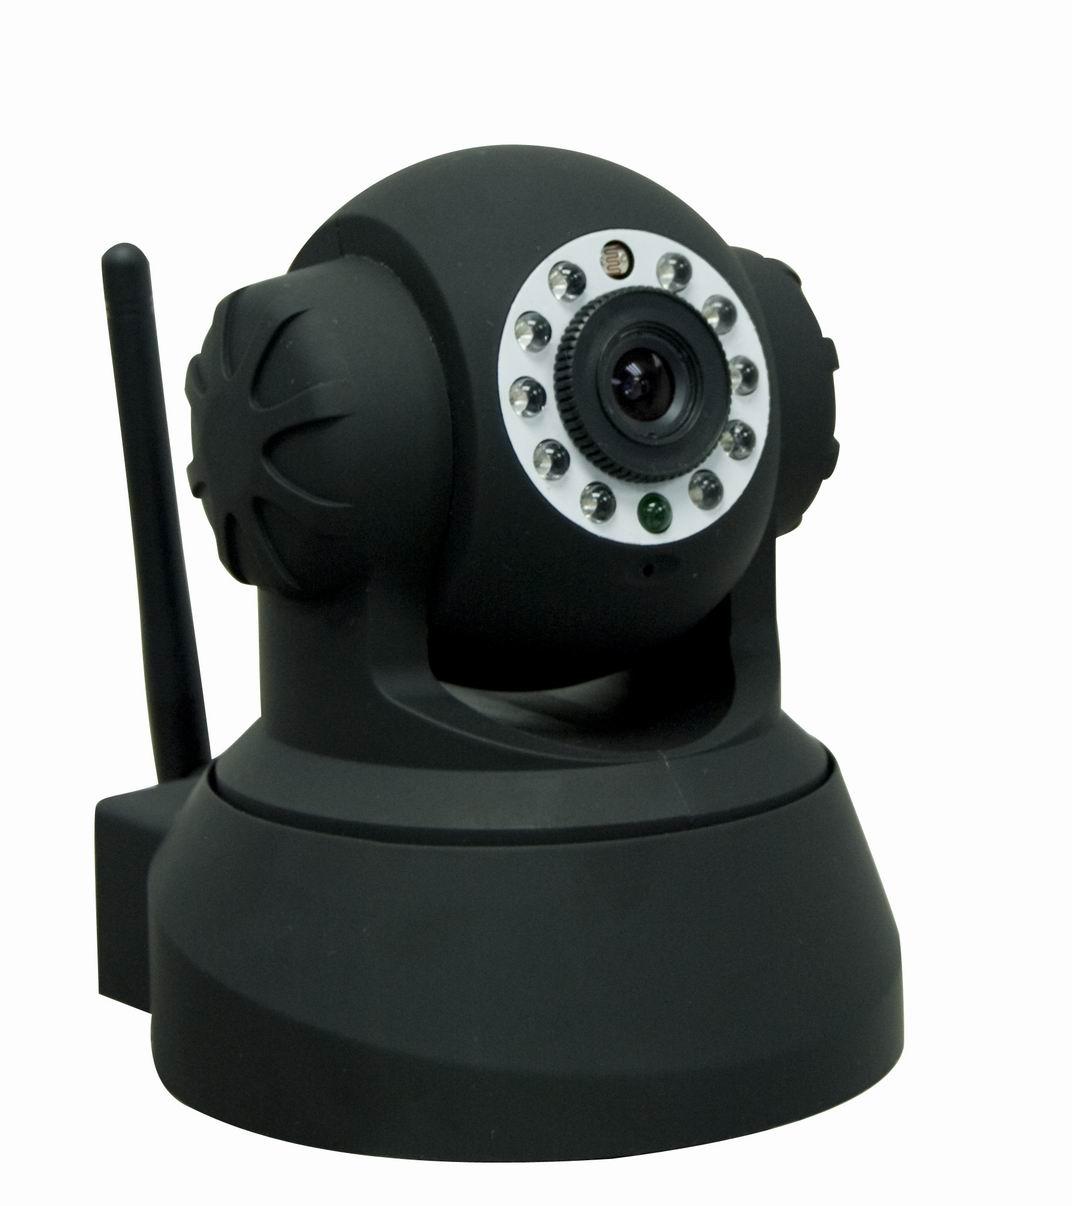 Wireless-IP-Camera